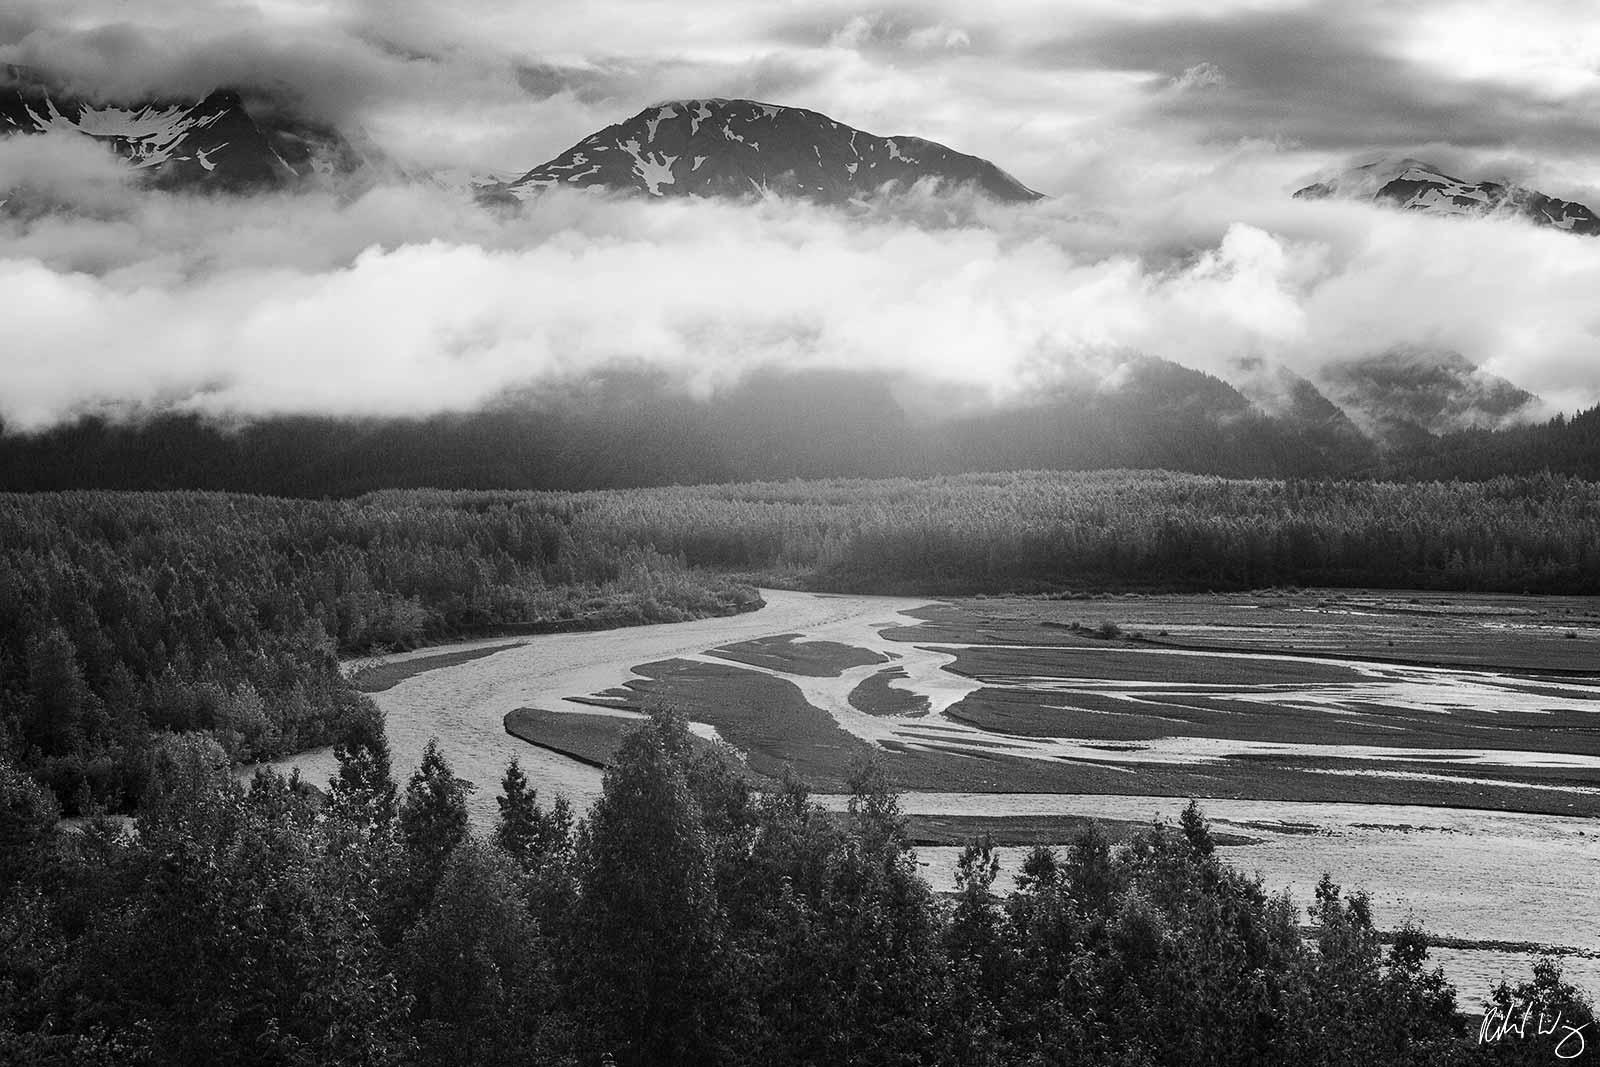 Black and White Photo: Resurrection River Scenic Vista From Exit Glacier Trail, Kenai Fjords National Park, Alaska